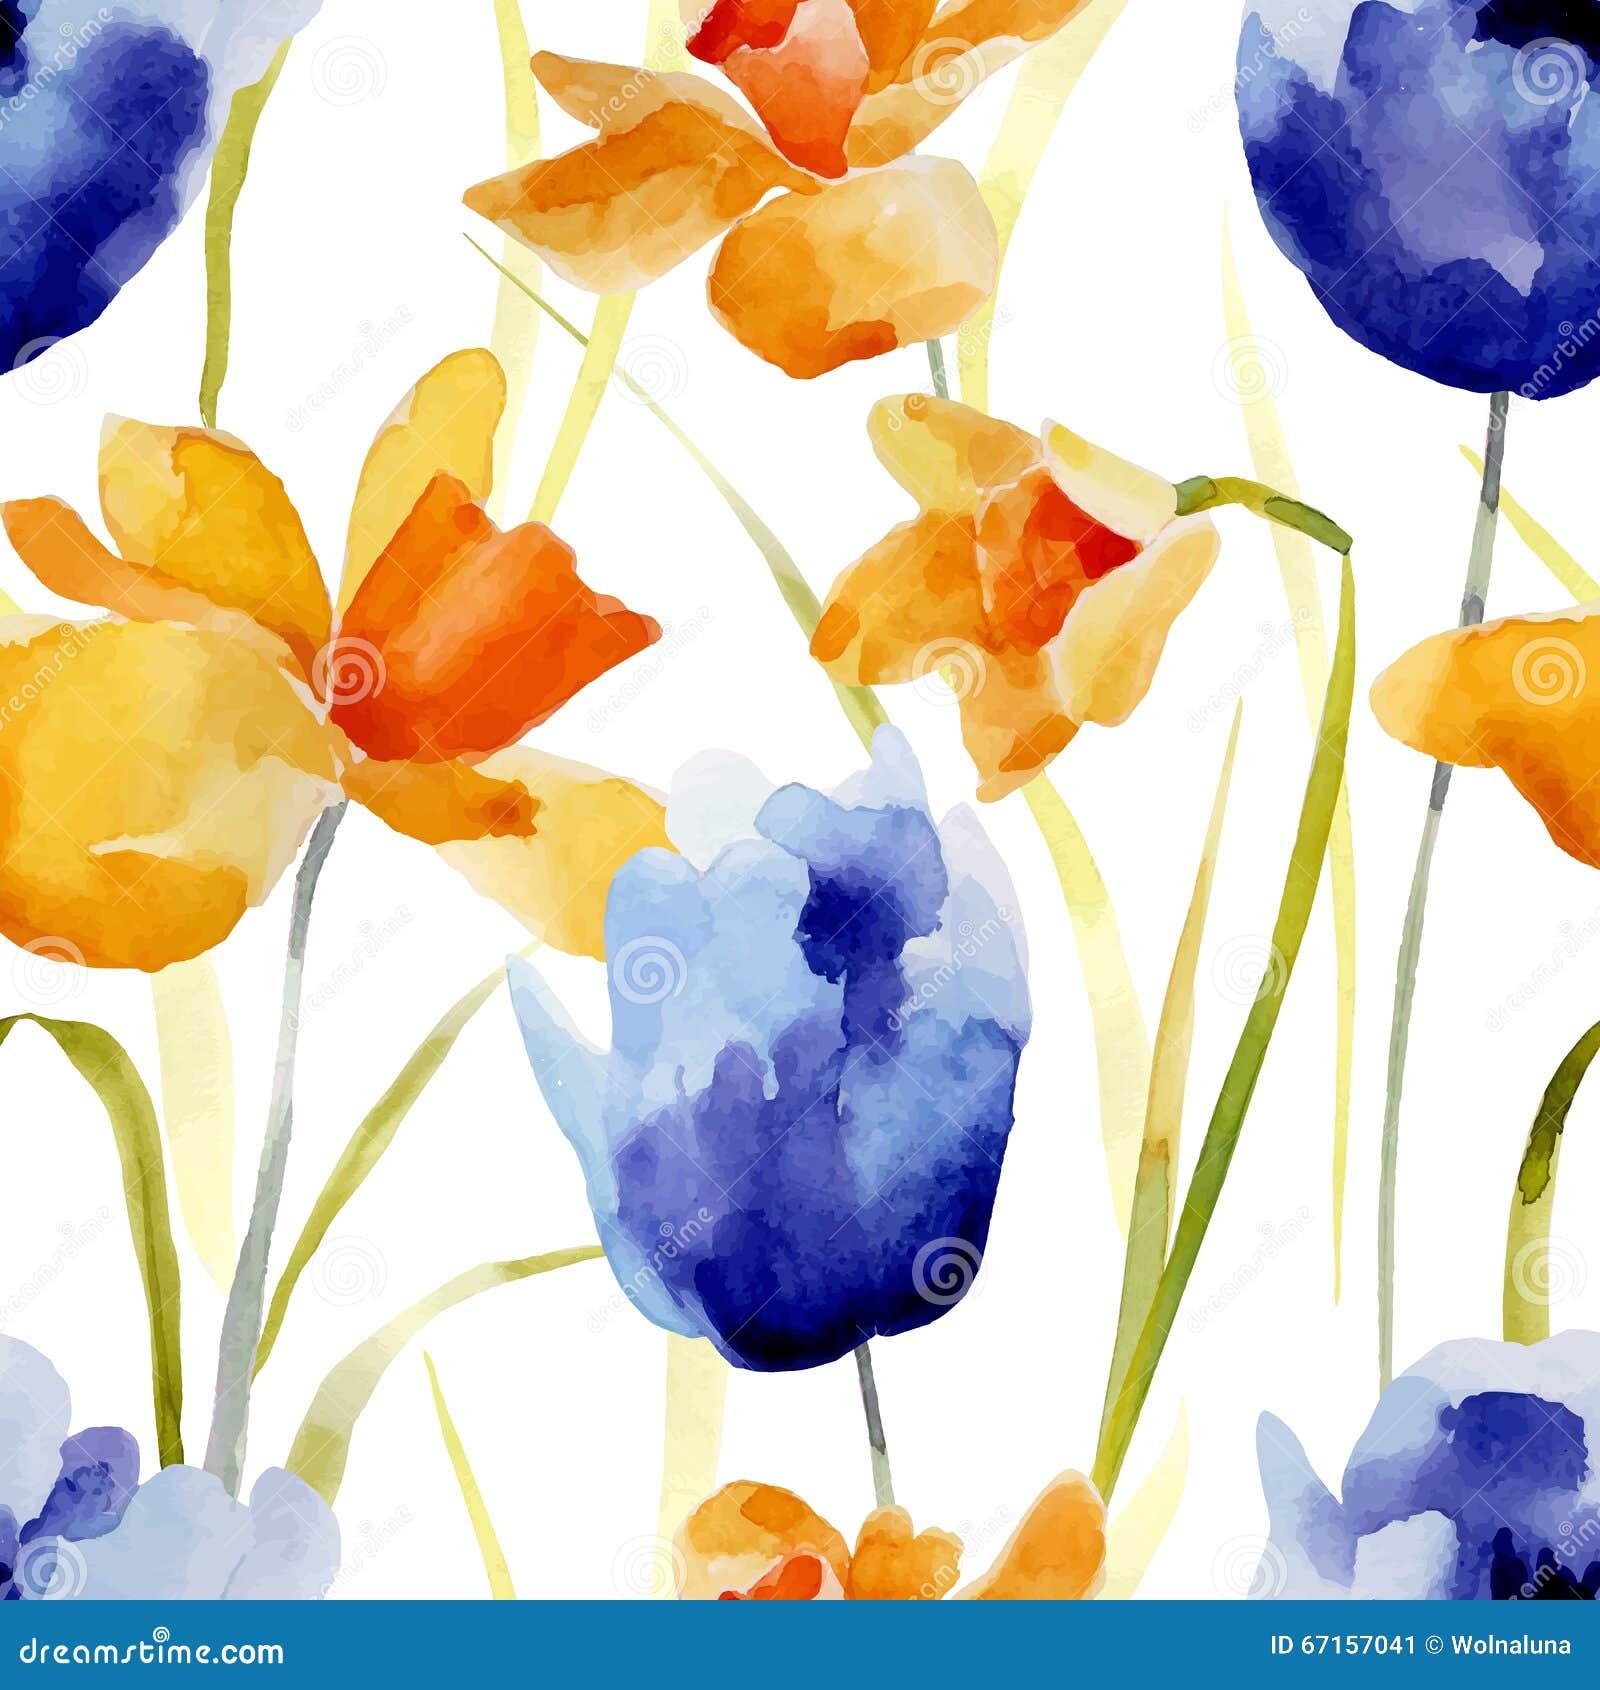 Watercolor flowers seamless pattern.